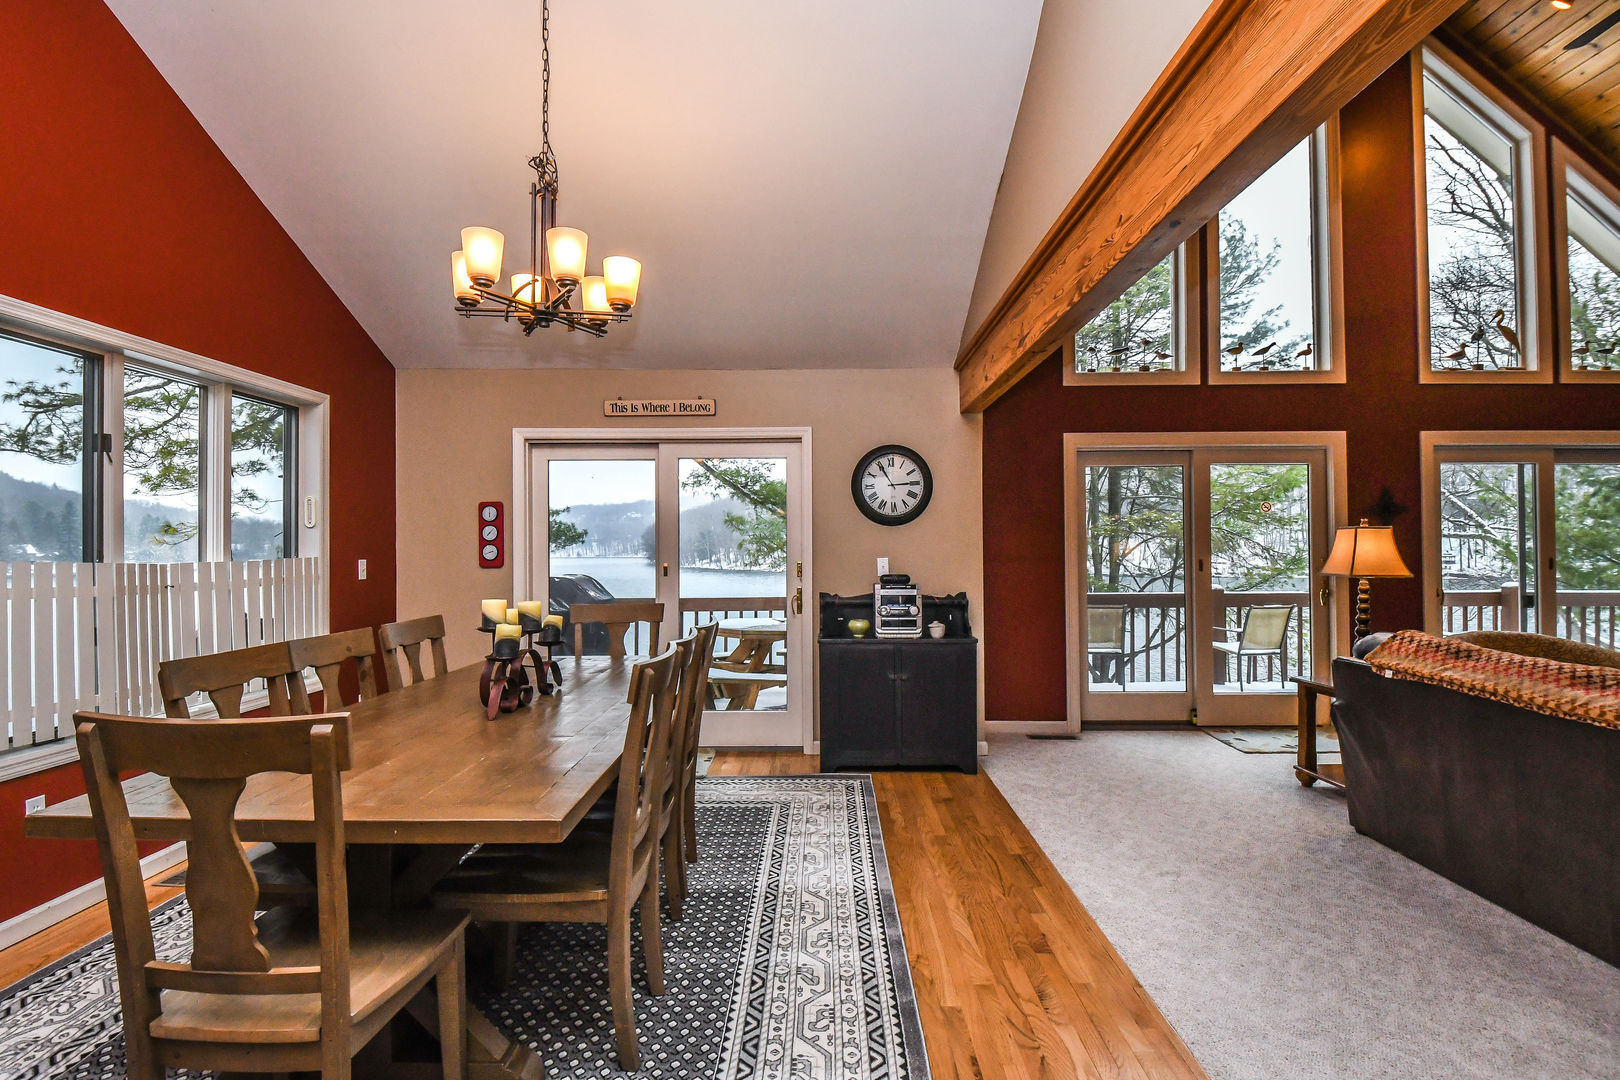 Hardwood Floor Repair Colorado Springs Of Million Dollar View Taylor Made Deep Creek Vacations Sales with Image 152800217